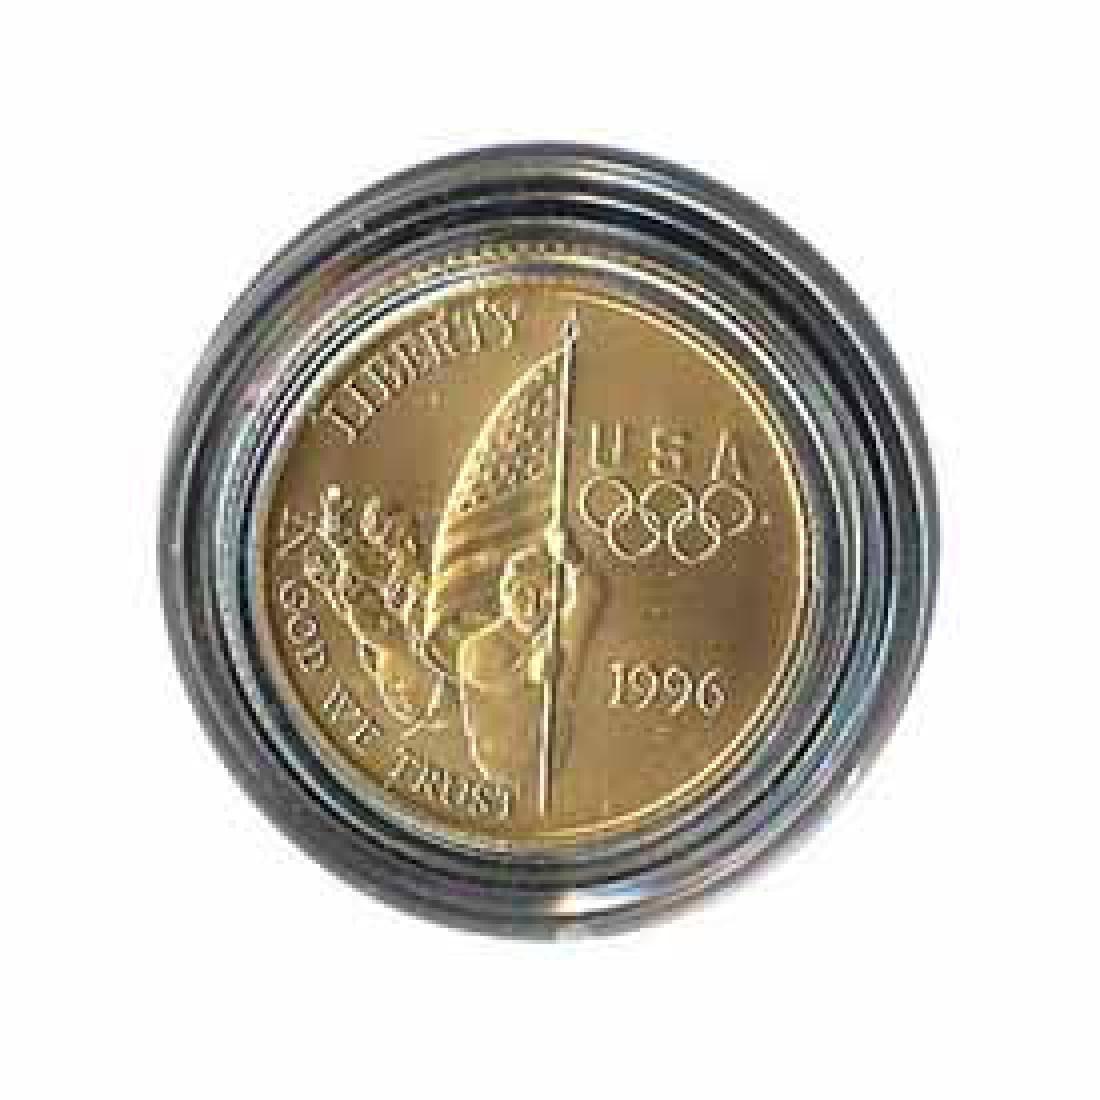 Gold $5 Commemorative 1996 Flag BU